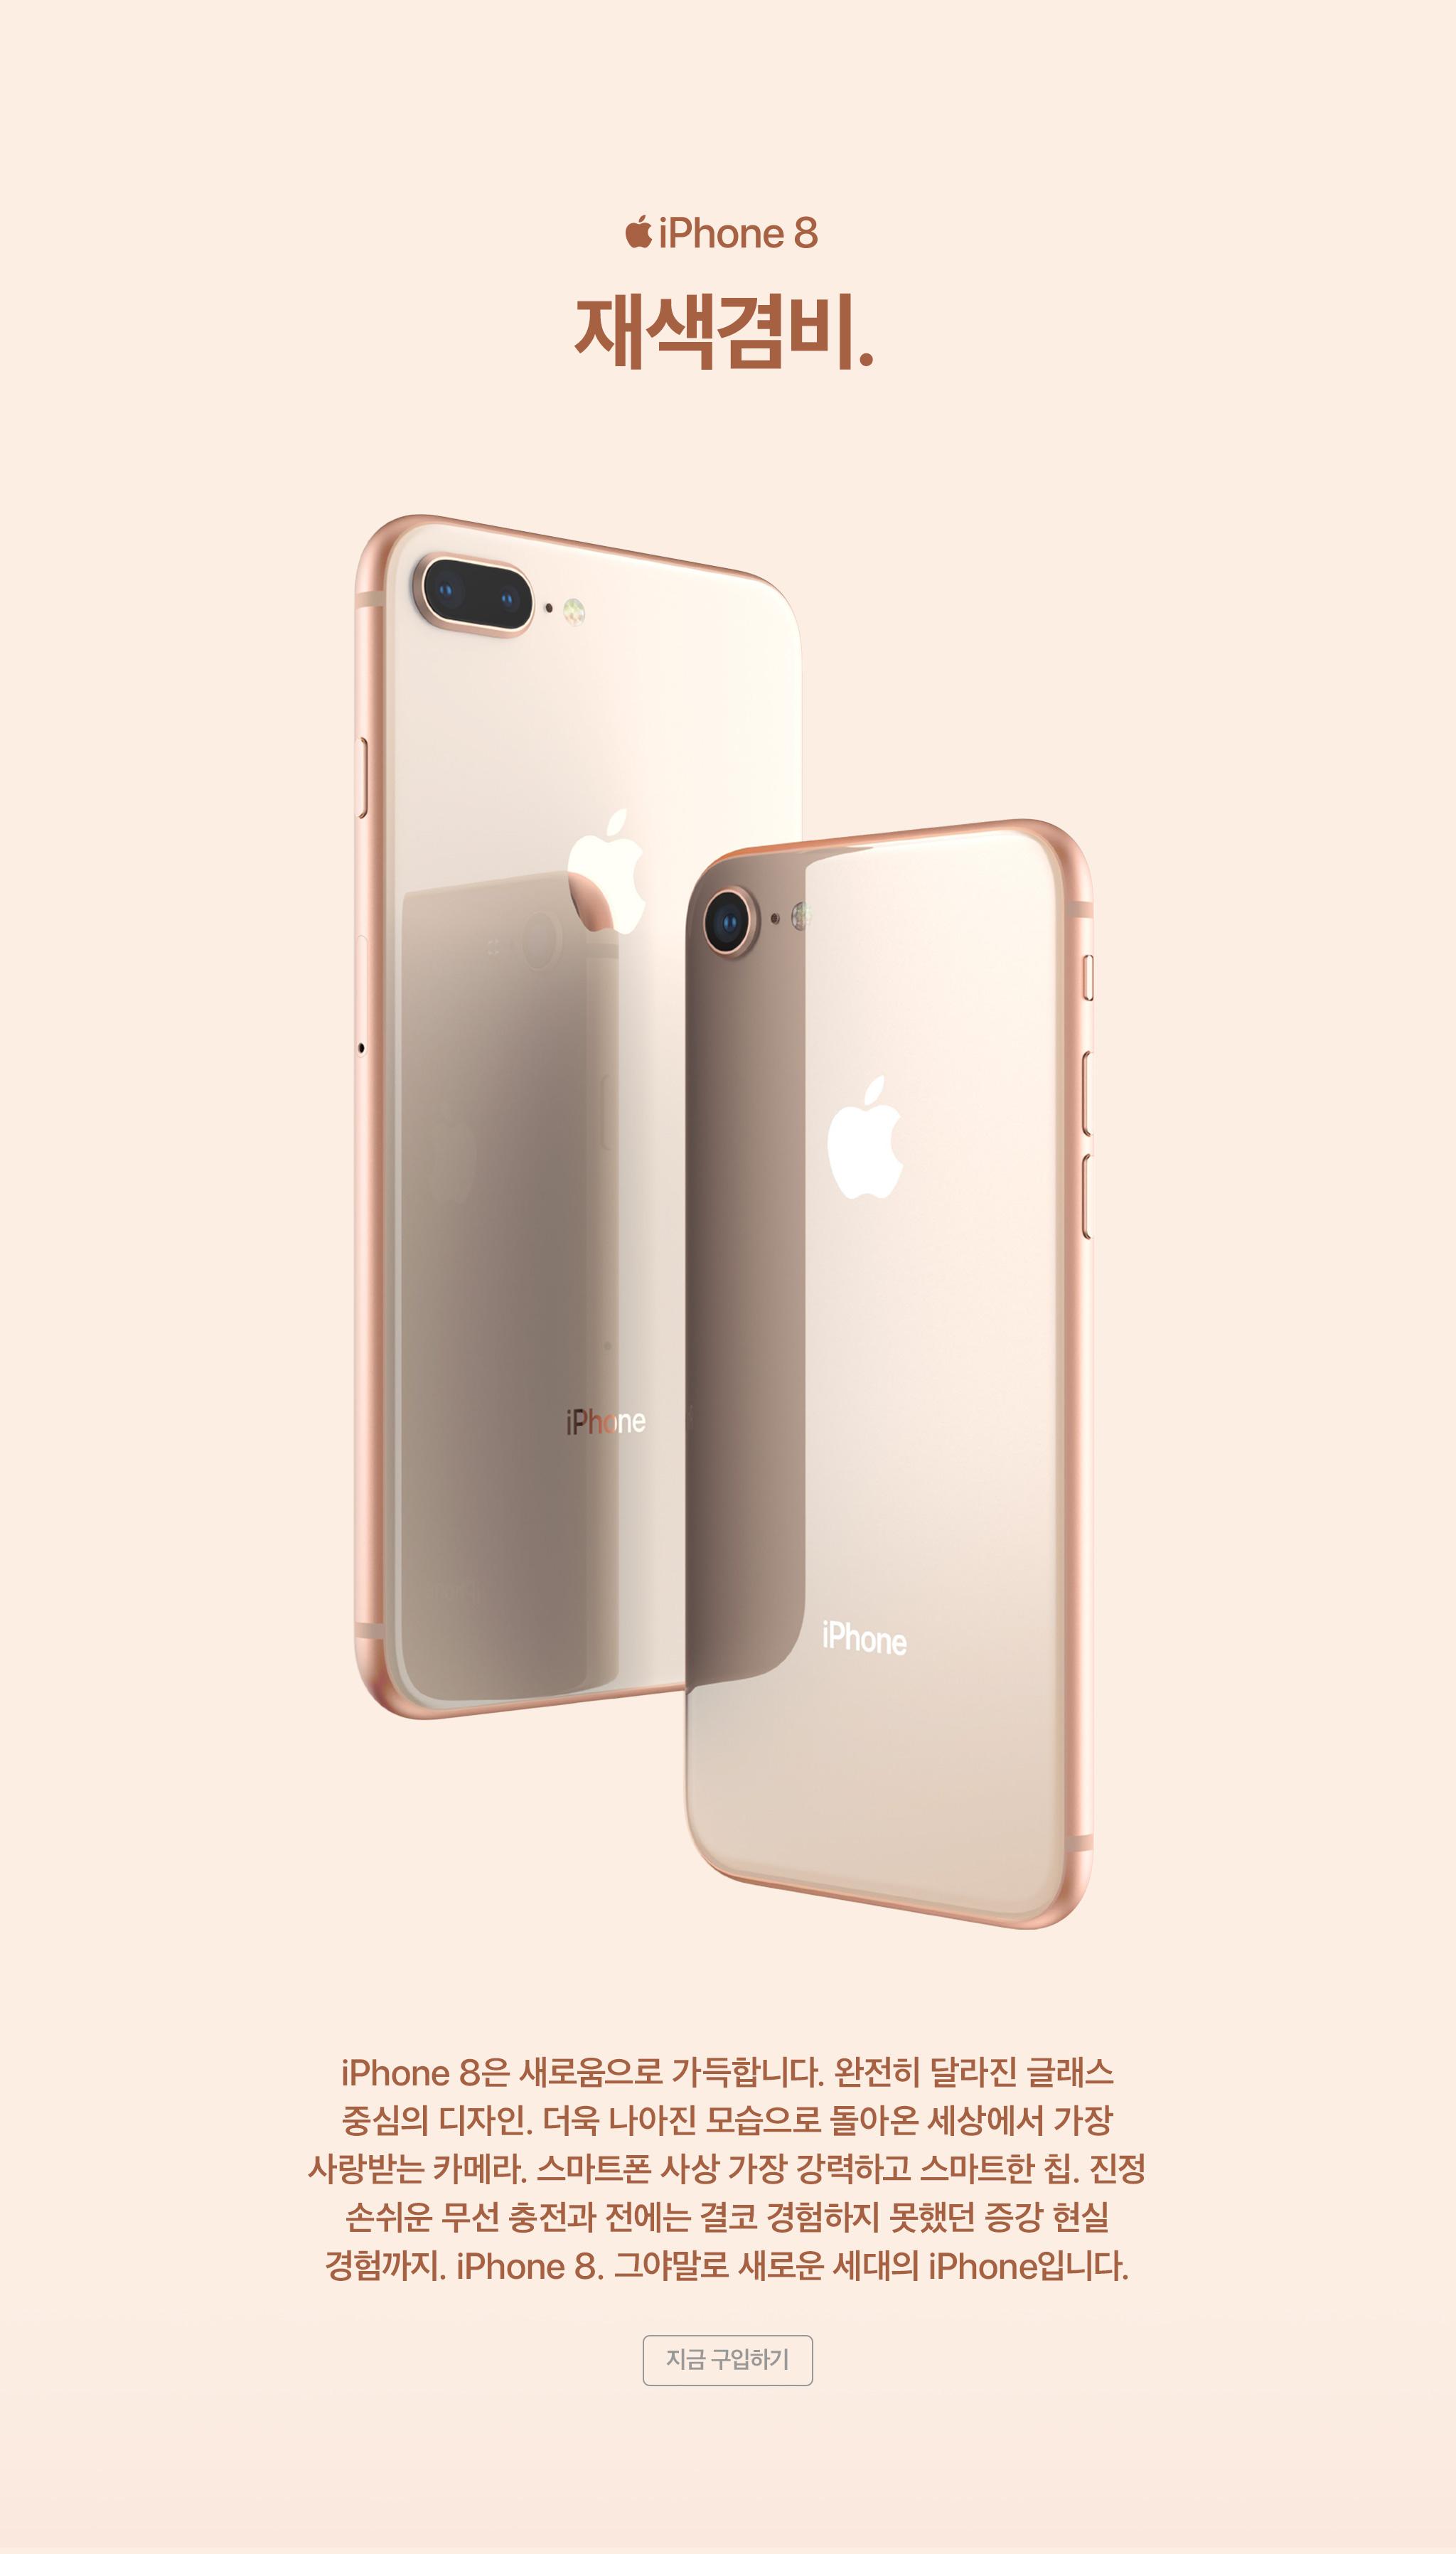 iPhone8 재색겸비 - iPhone 8은 새로움으로 가득합니다. 완전히 달라진 글래스 중심의 디자인. 더욱 나아진 모습으로 돌아온 세상에서 가장 사랑받는 카메라. 스마트폰 사상 가장 강력하고 스마트한 칩. 지정 손쉬운 무선 충전과 전에는 결코 경험하지 못했던 증강 현실 경험까지. iPhone 8. 그야말로 새로운 세대의 iPhone입니다.